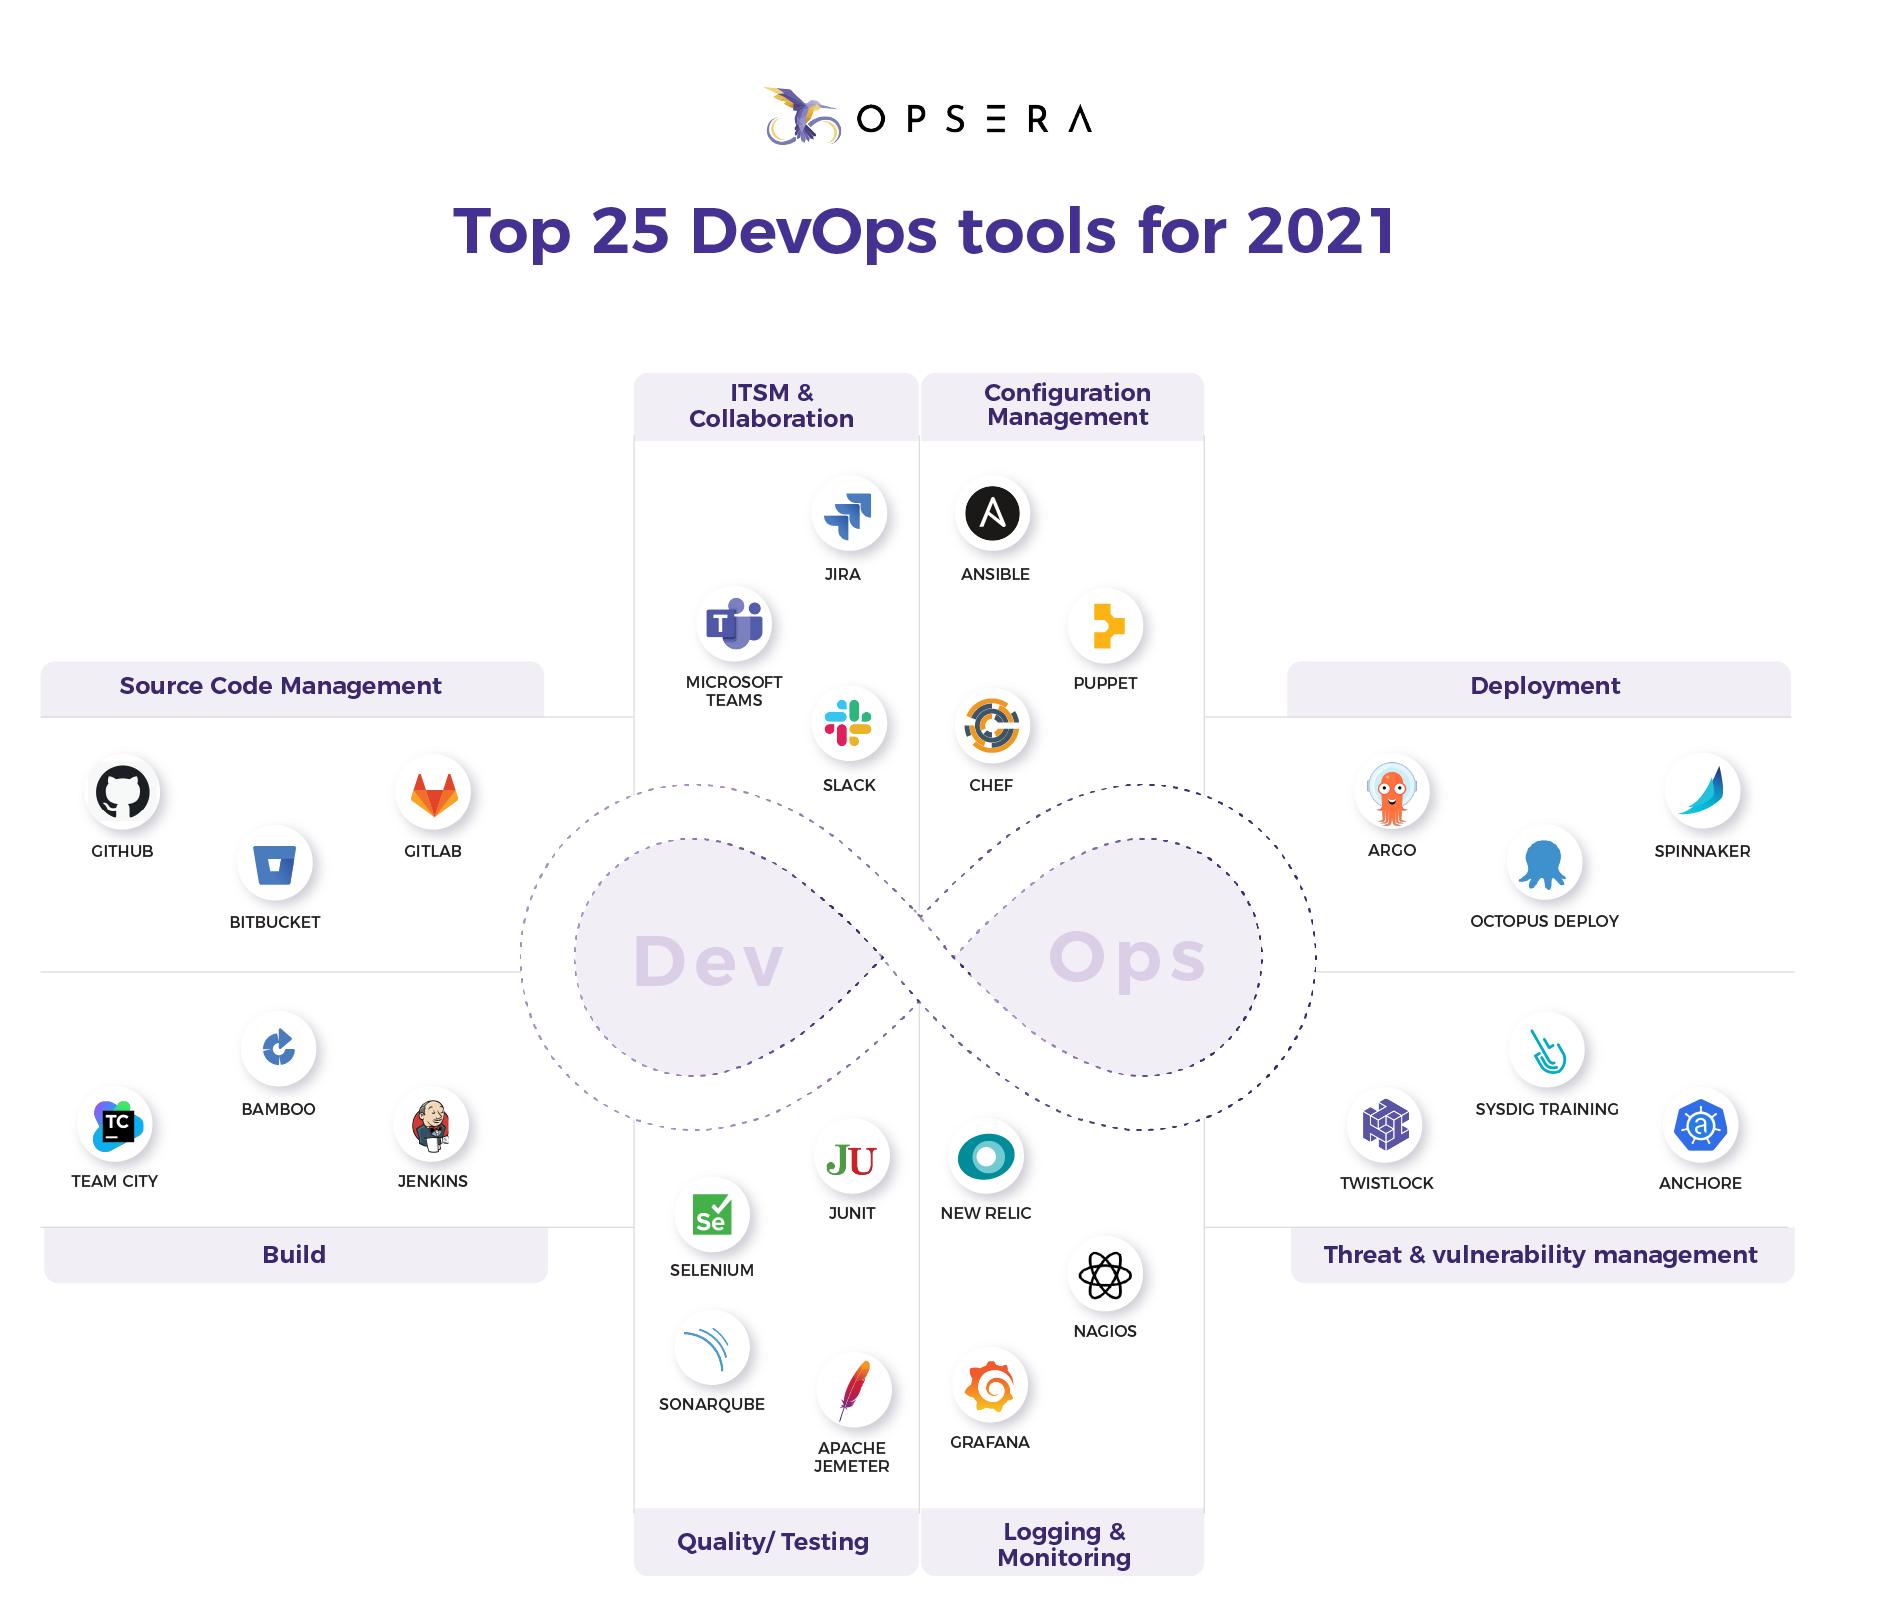 Top 25 DevOps tools for 2021 - Opsera.io